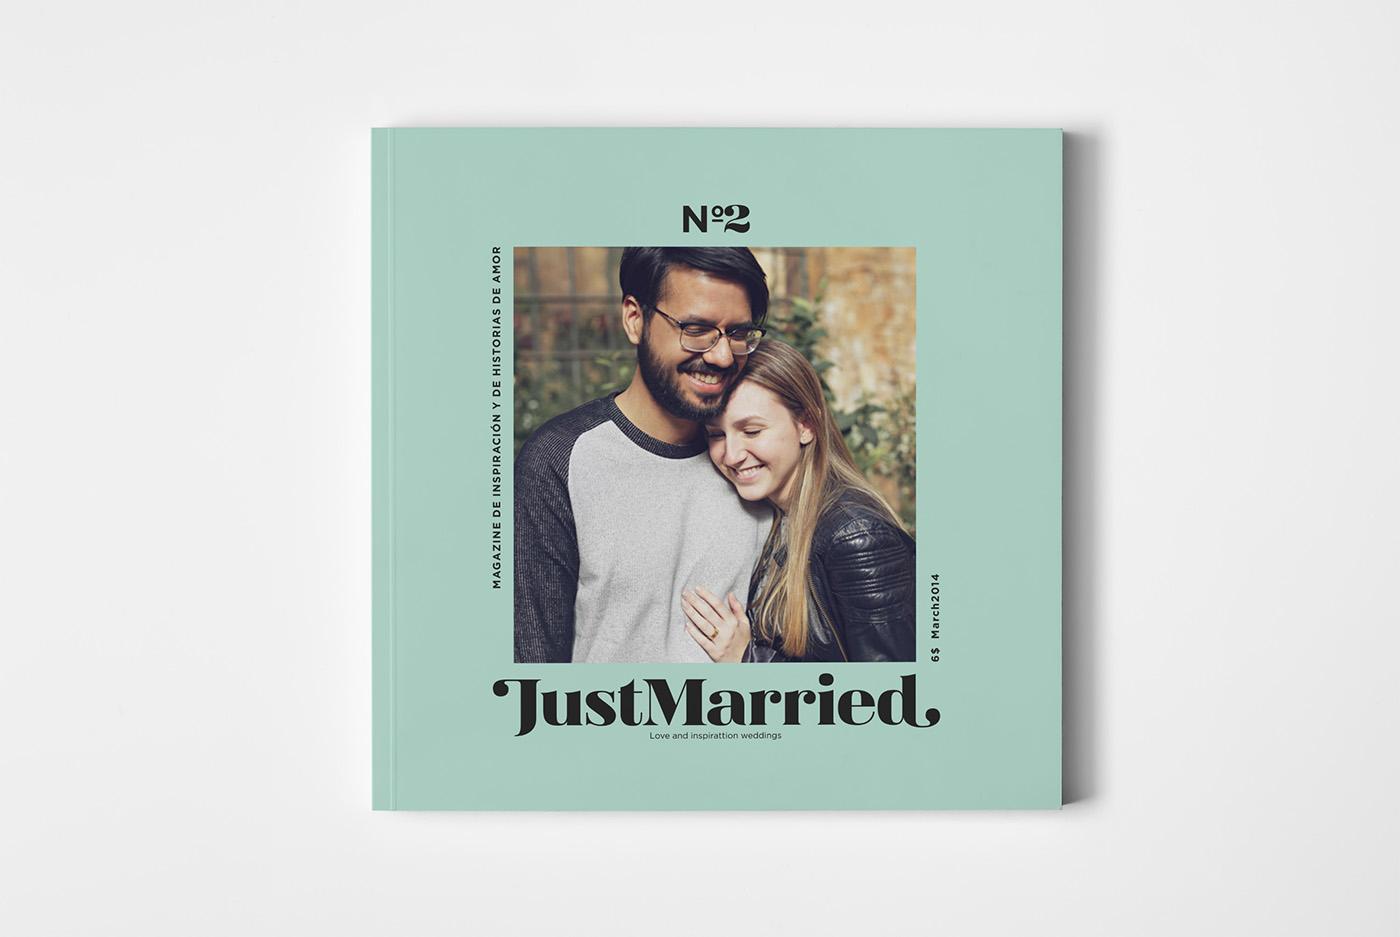 JustMarried - Love magazine by Daniel Iglesias - Creative Work